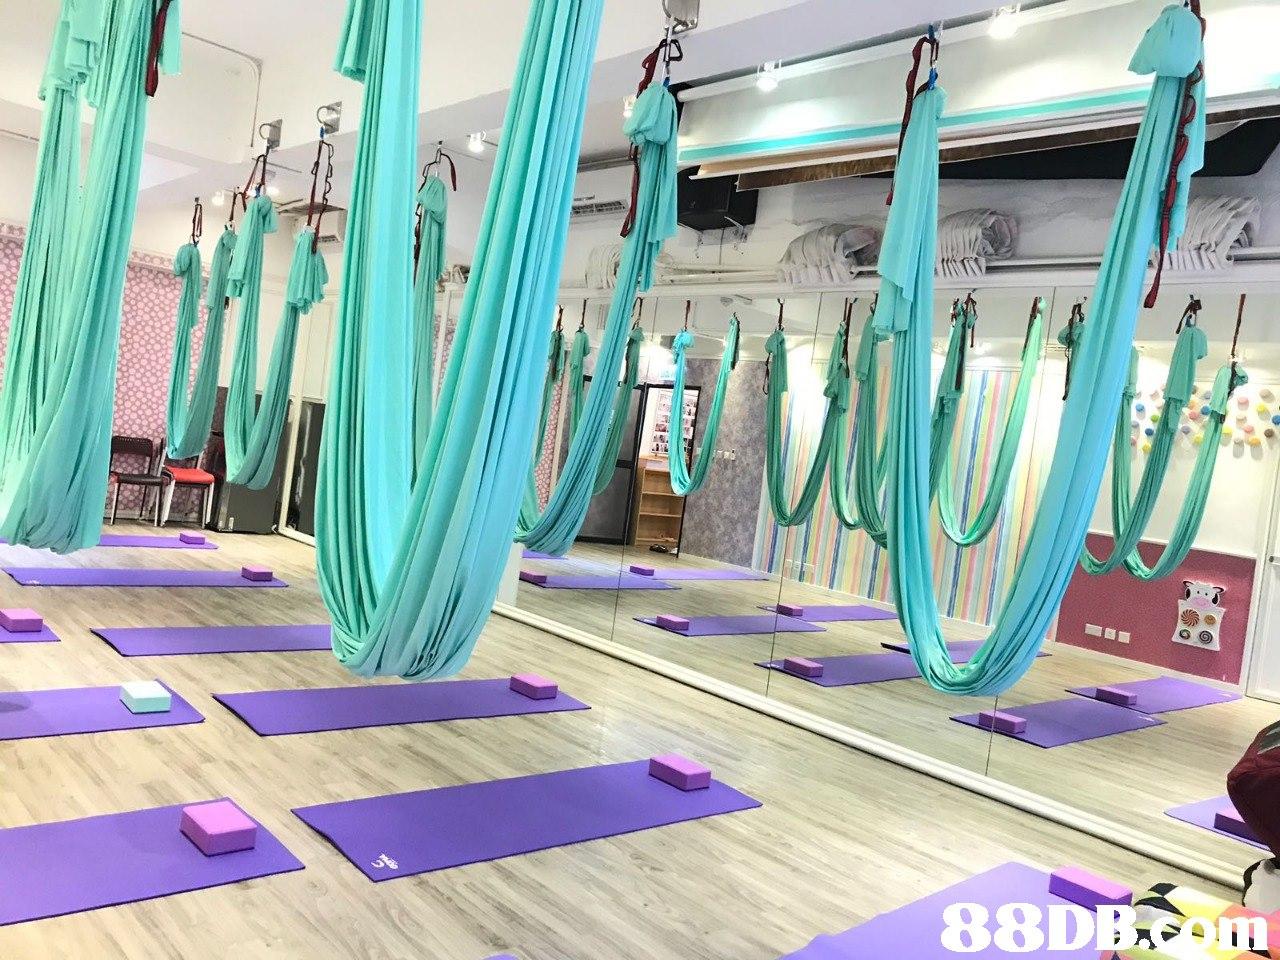 88DBA  room,structure,purple,leisure,sport venue